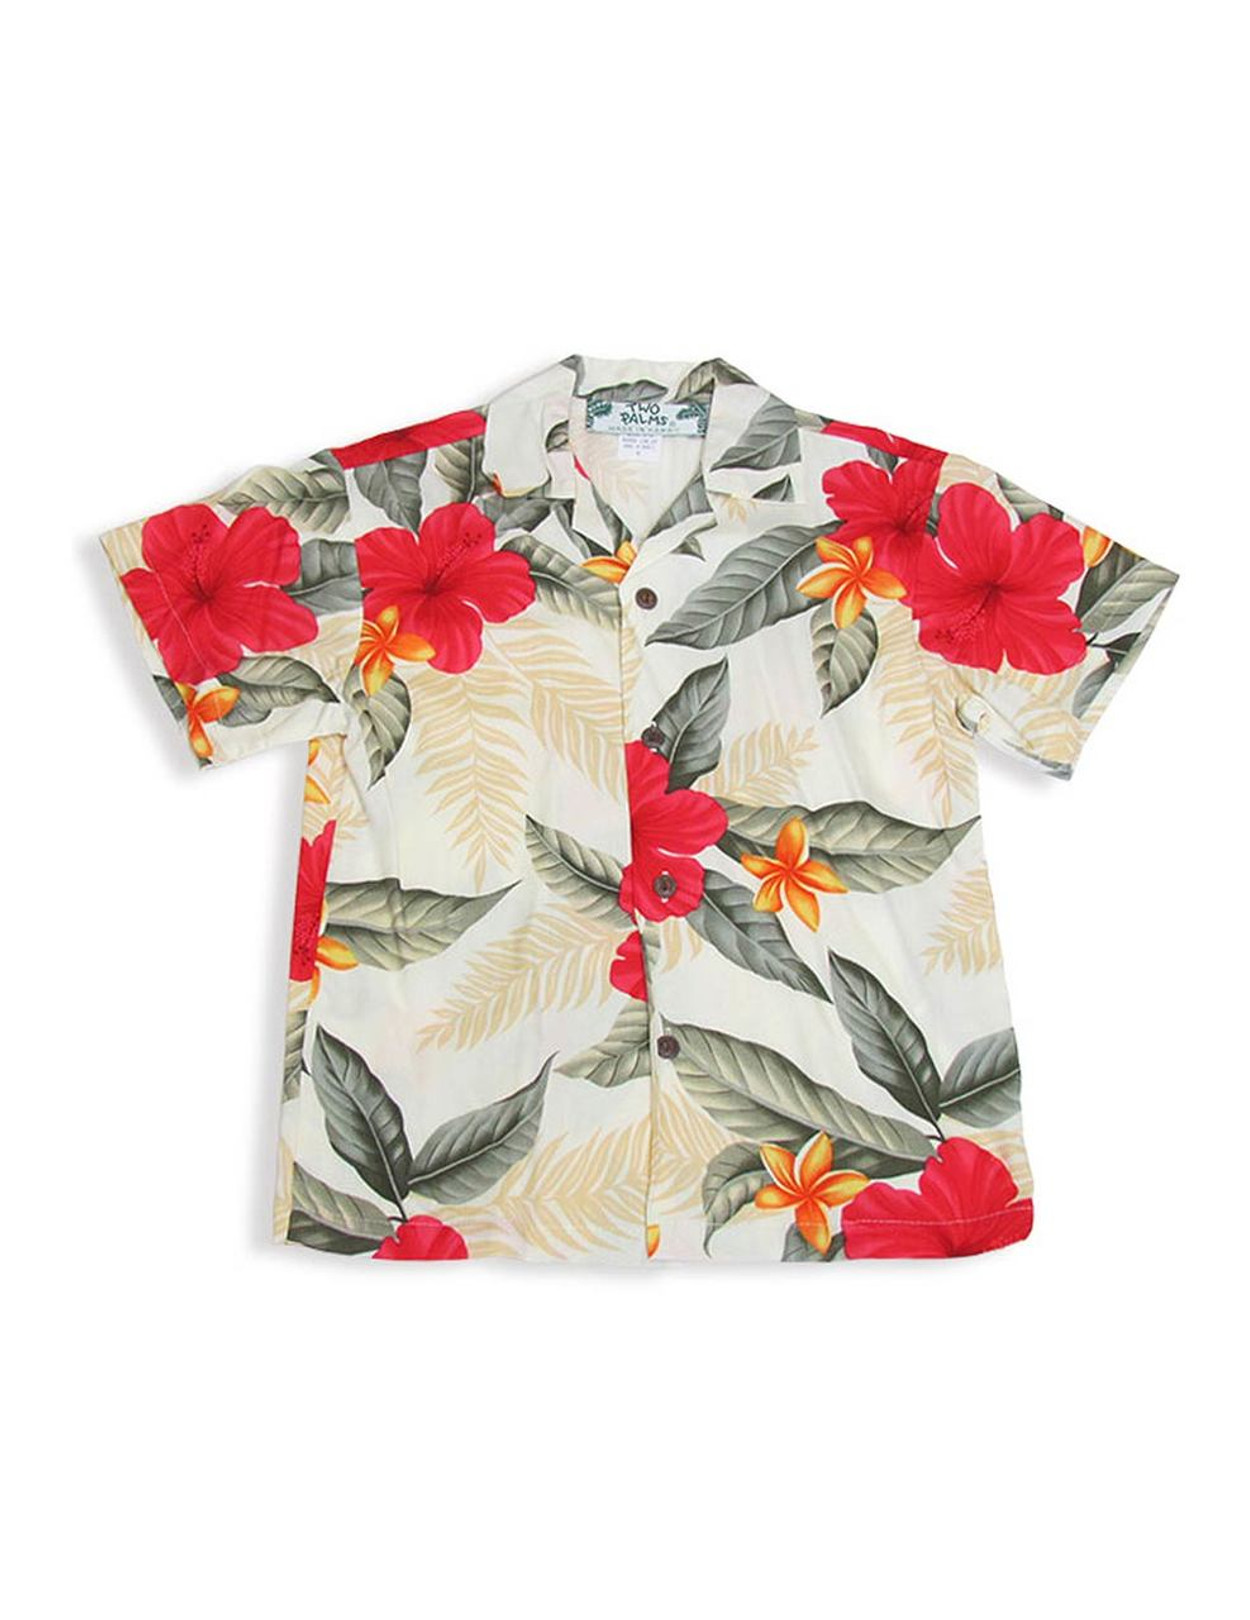 10e7d2464d Ula Ula Hibiscus Boy's Rayon Shirt Cream